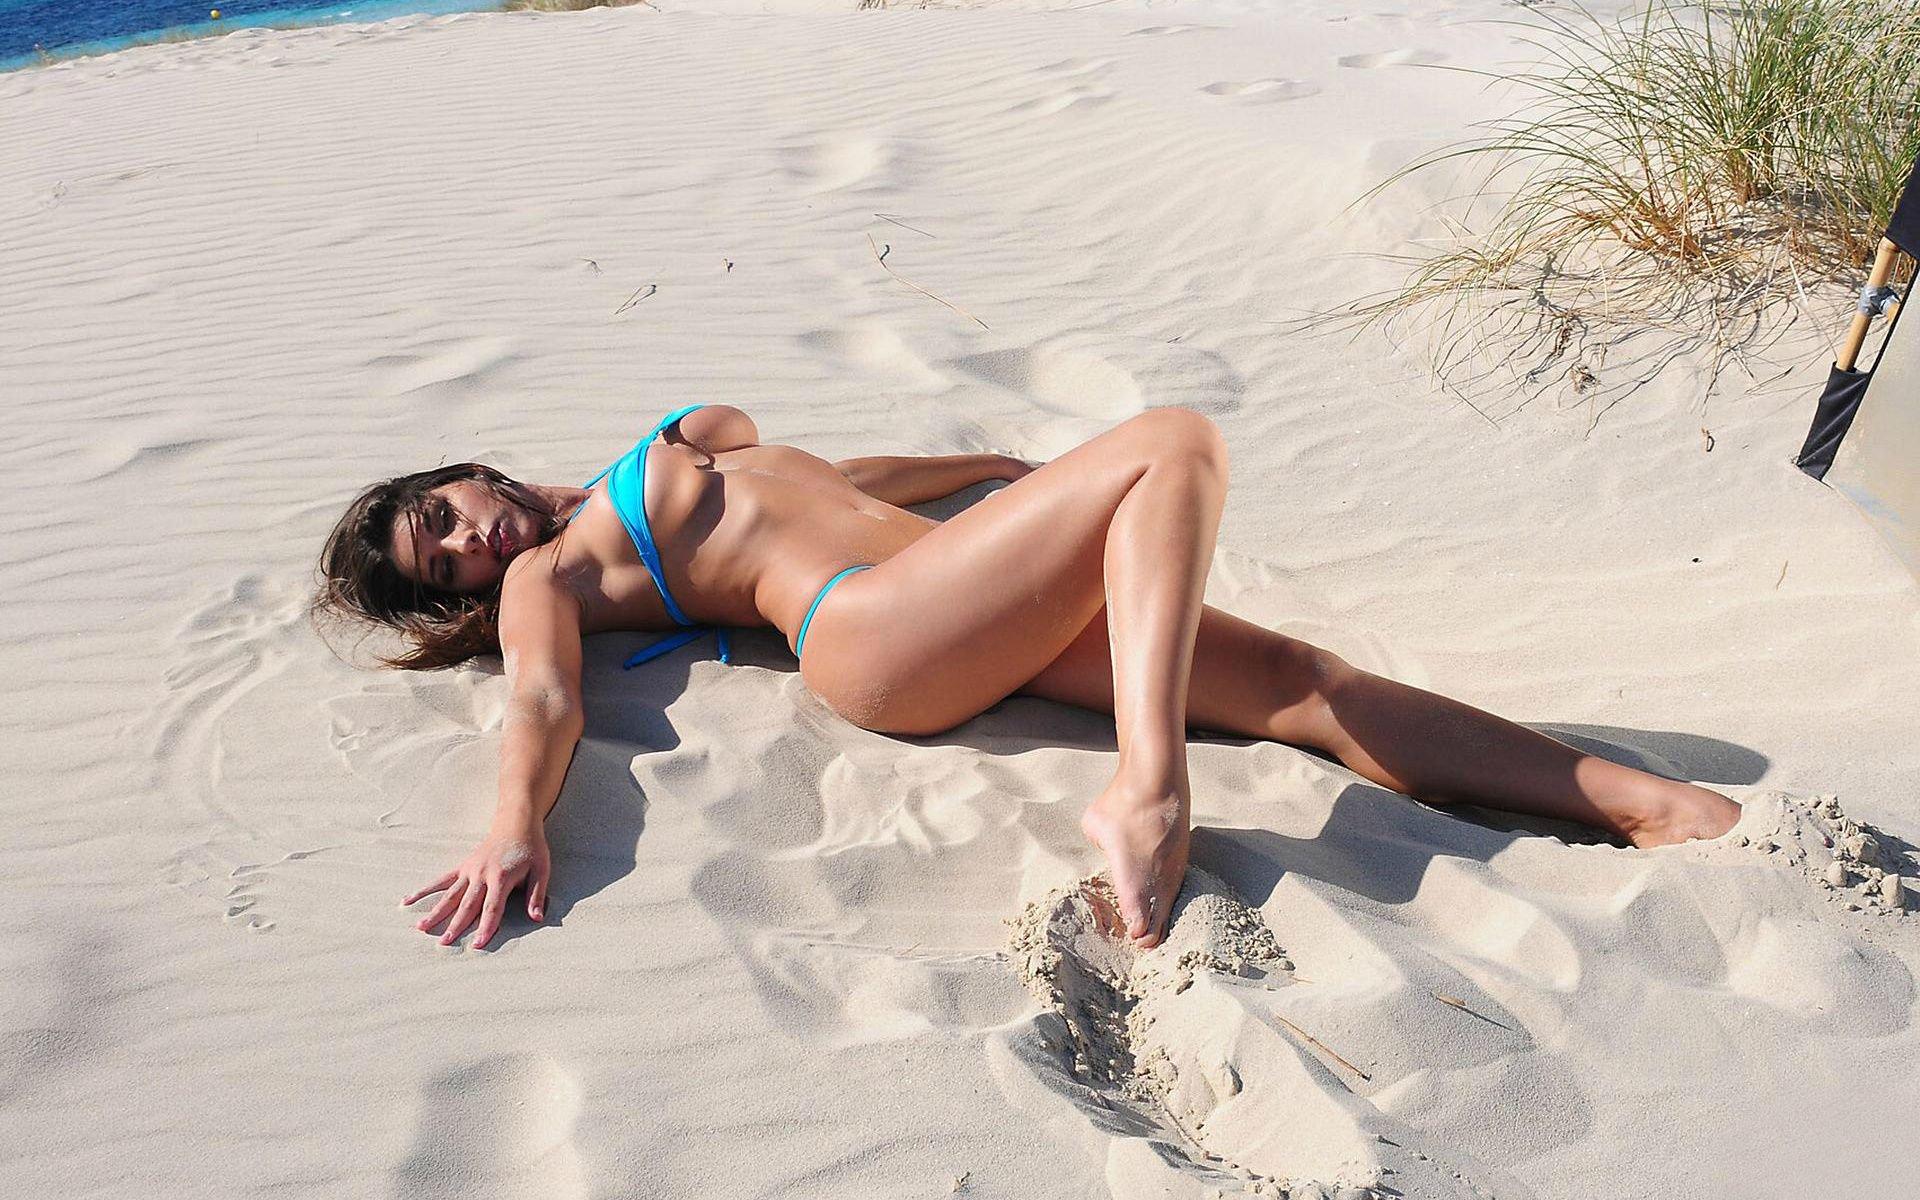 Фото брюнетка на пляже 19 фотография